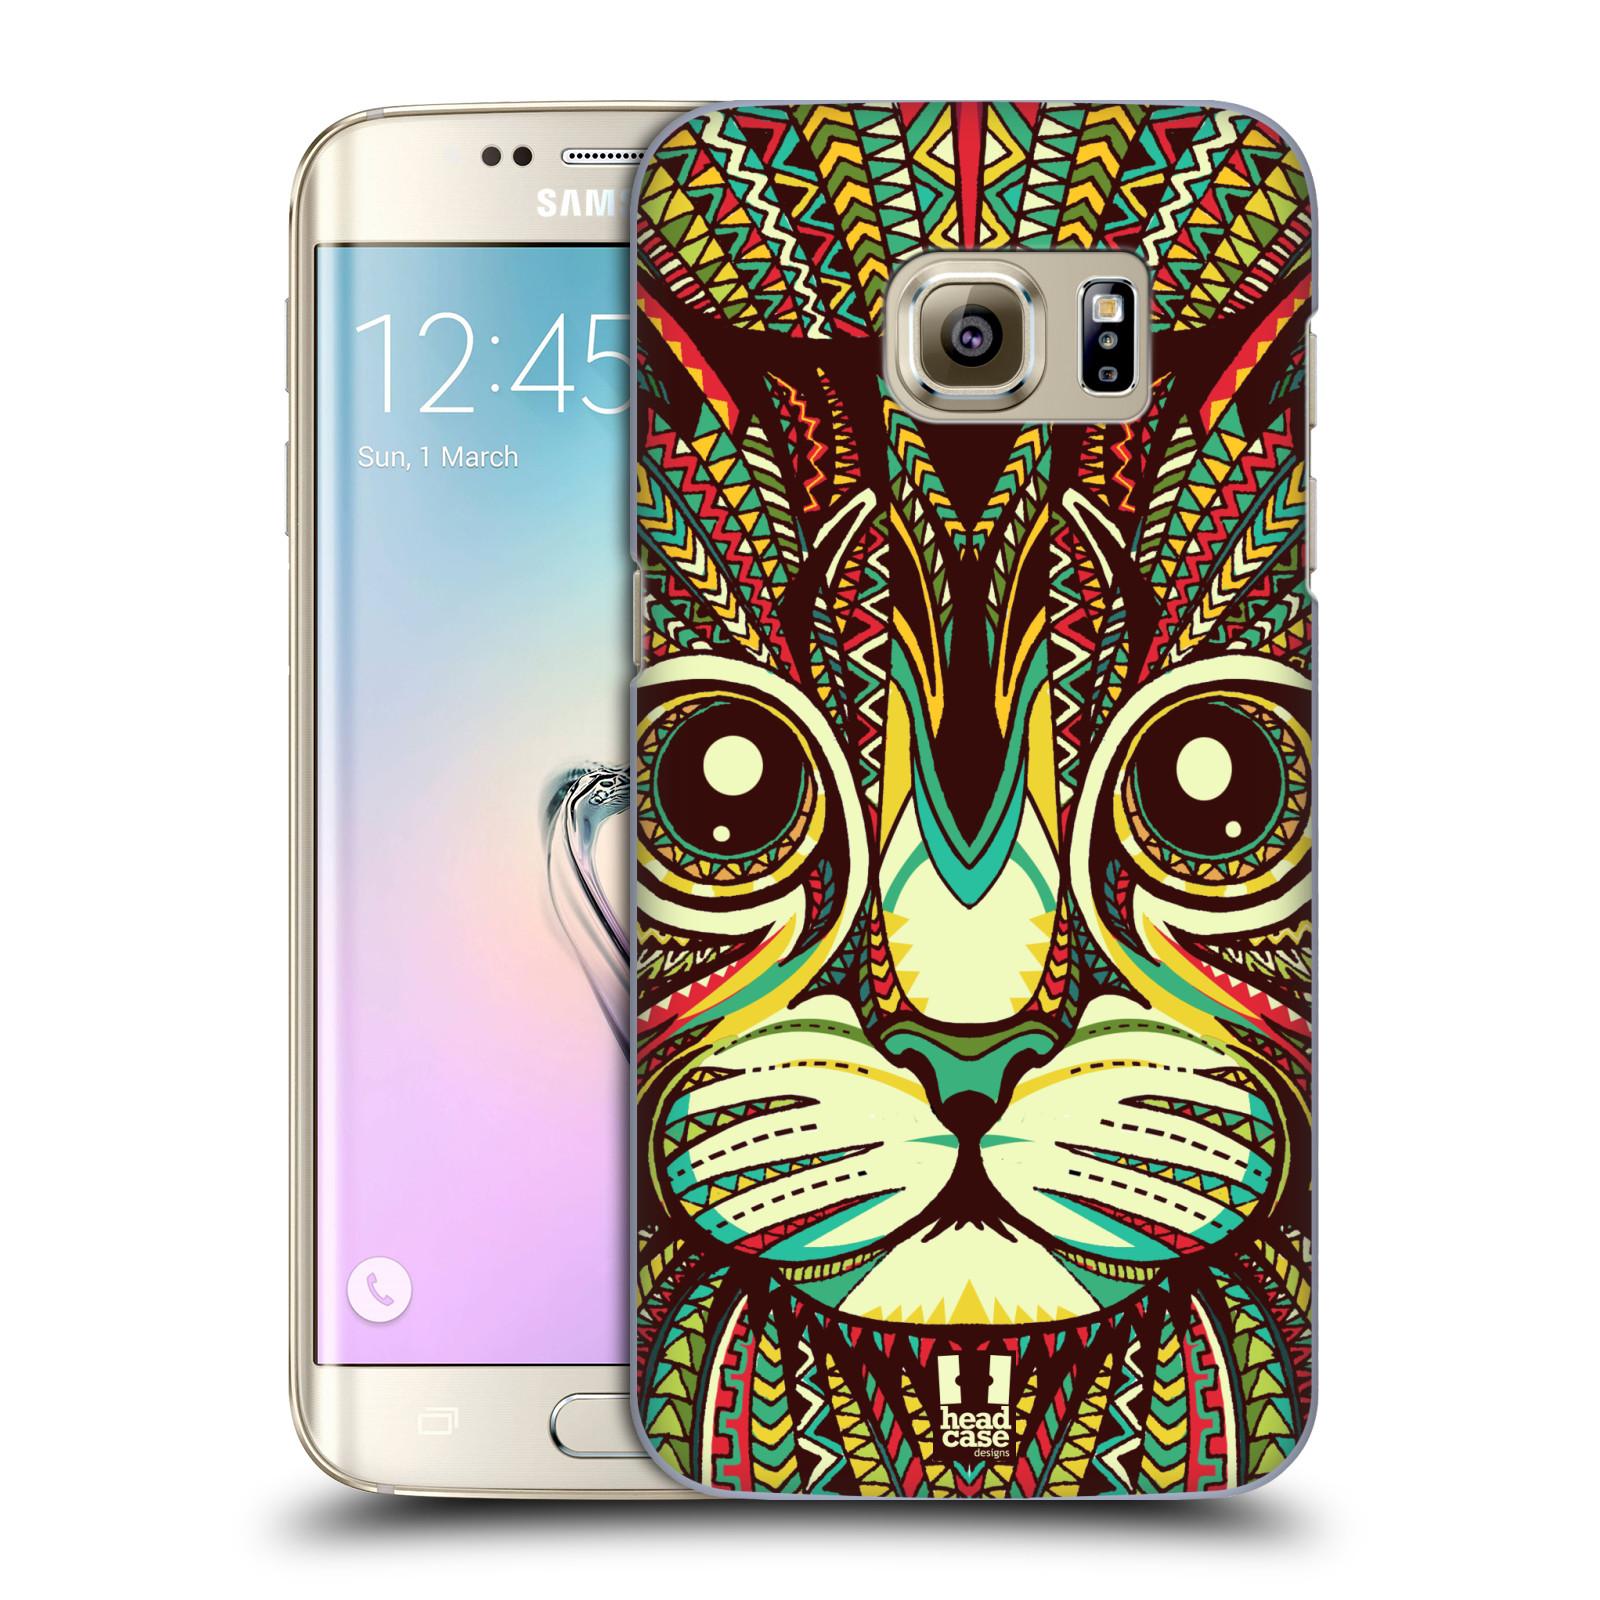 Plastové pouzdro na mobil Samsung Galaxy S7 Edge HEAD CASE AZTEC KOČKA (Kryt  či obal 859a28089c6